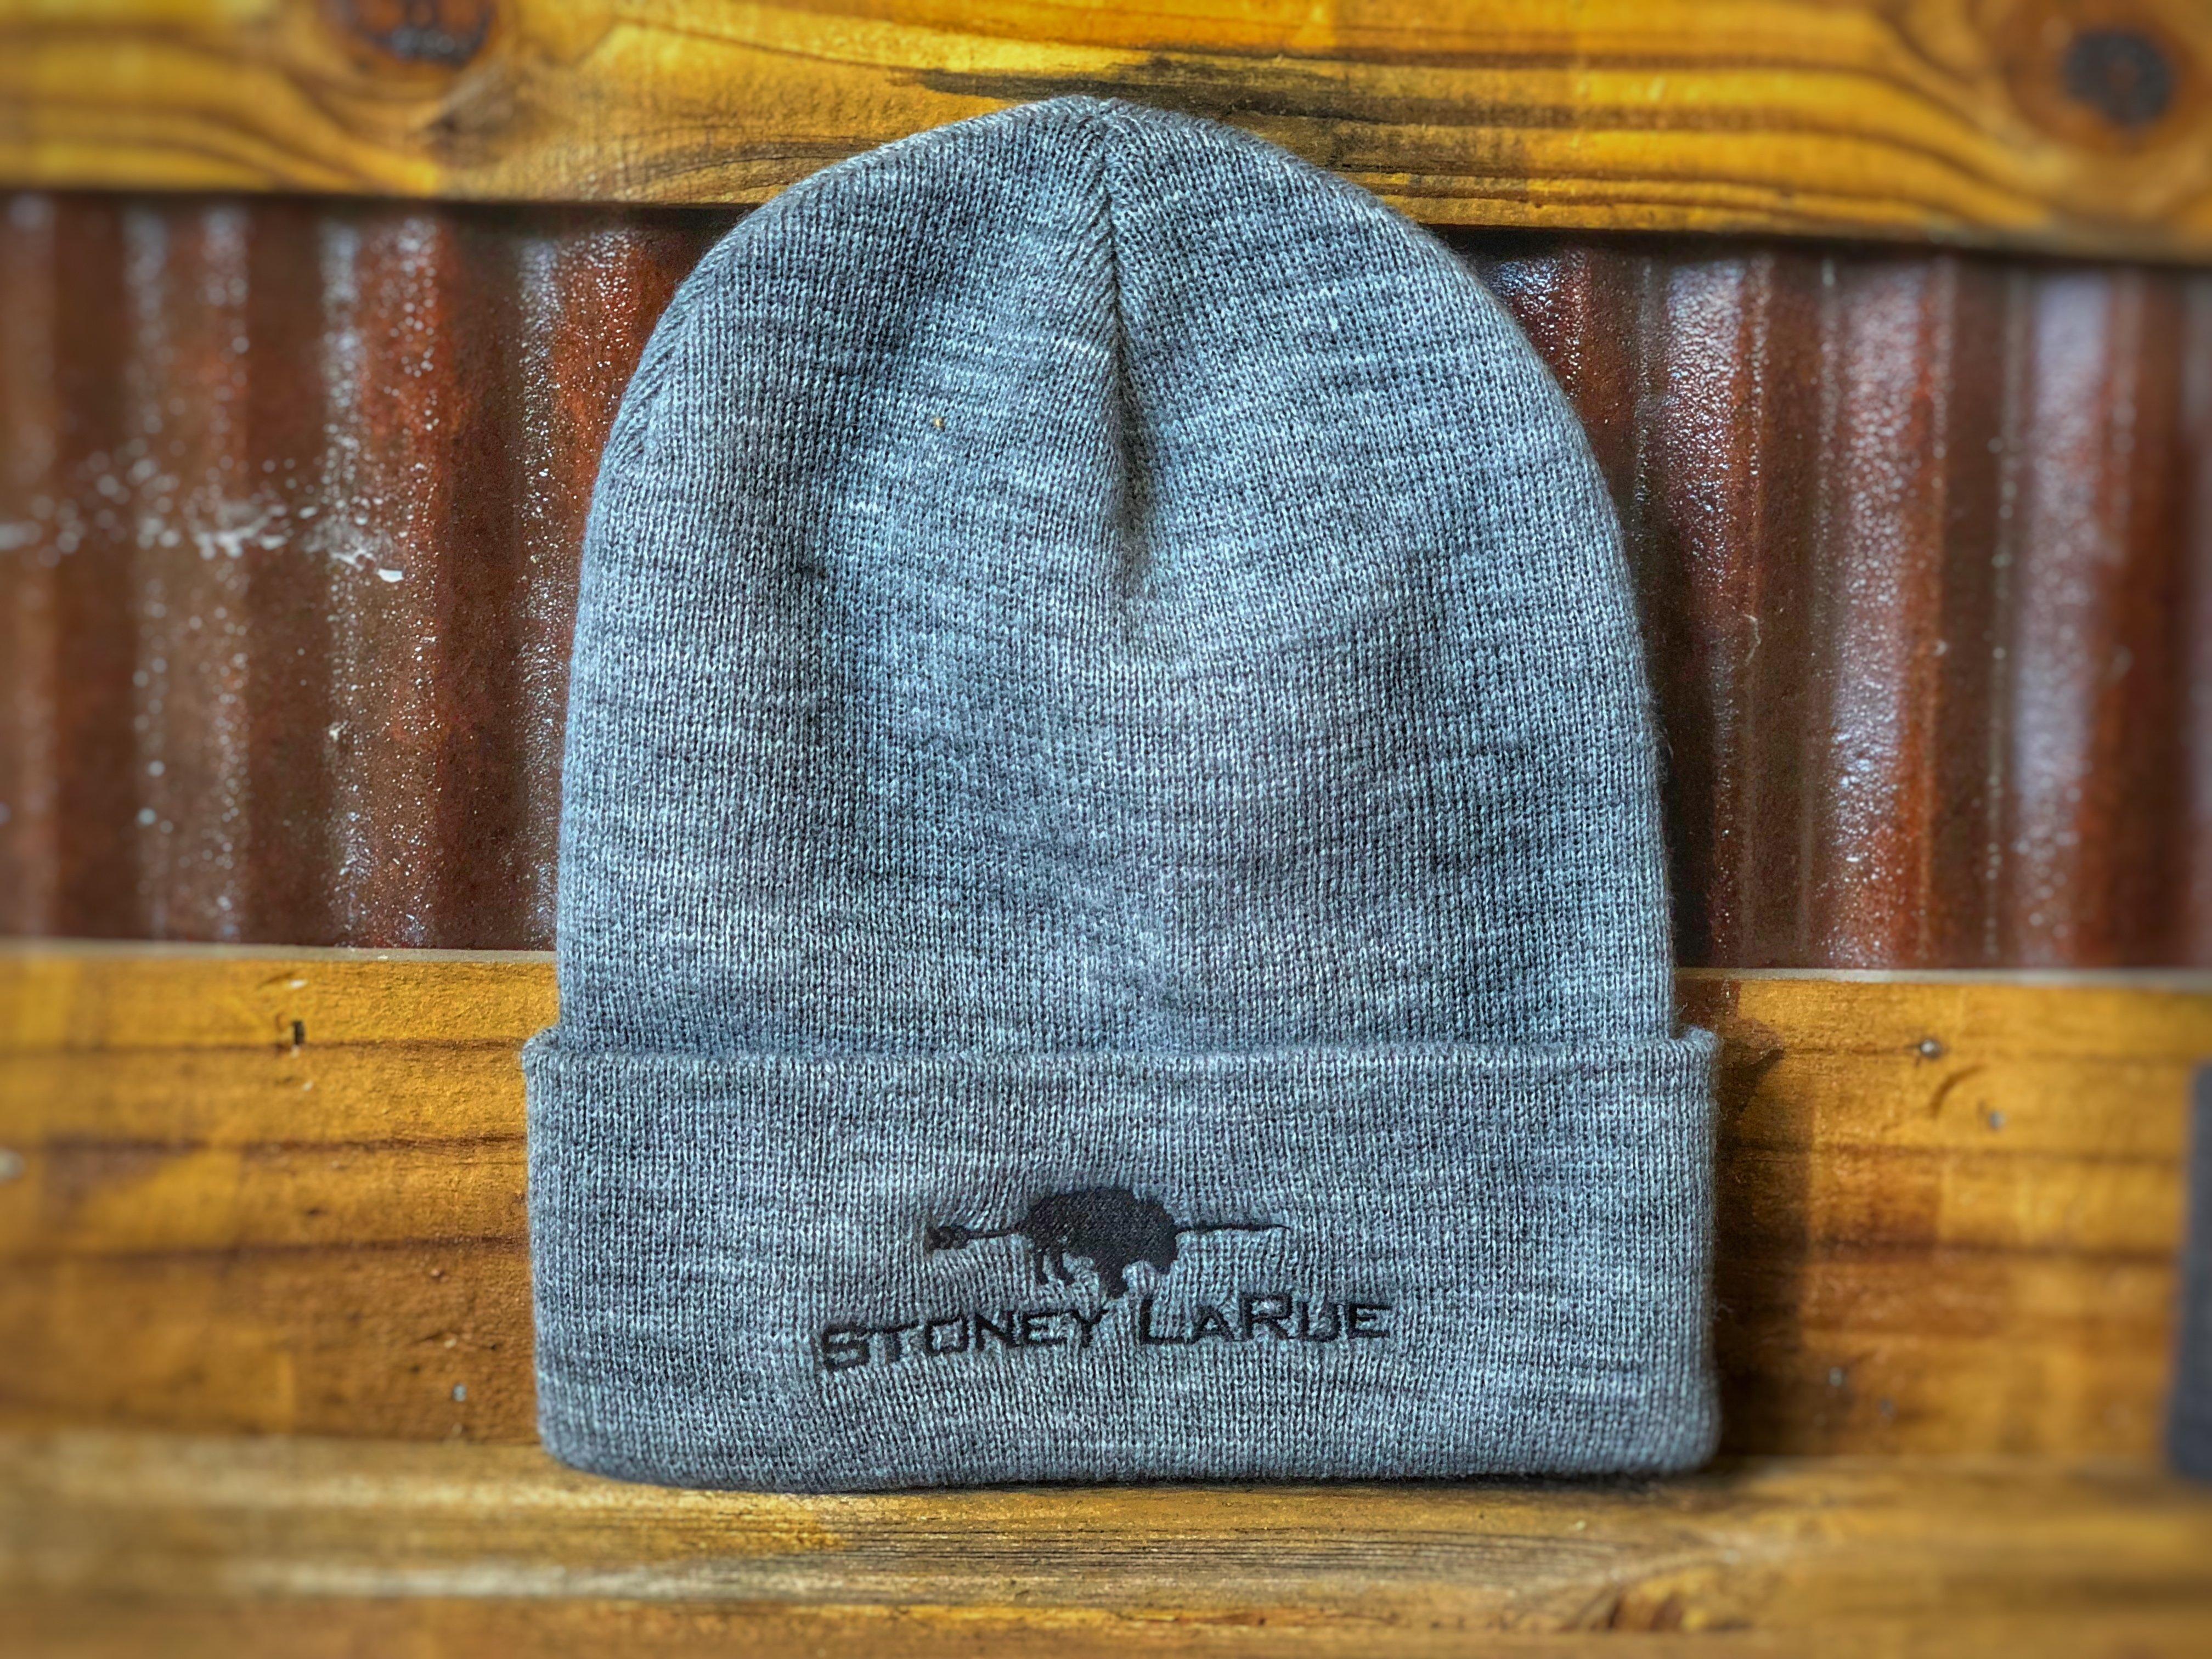 Stoney LaRue Beanie (Standard, Available in Gray or Dark Gray)